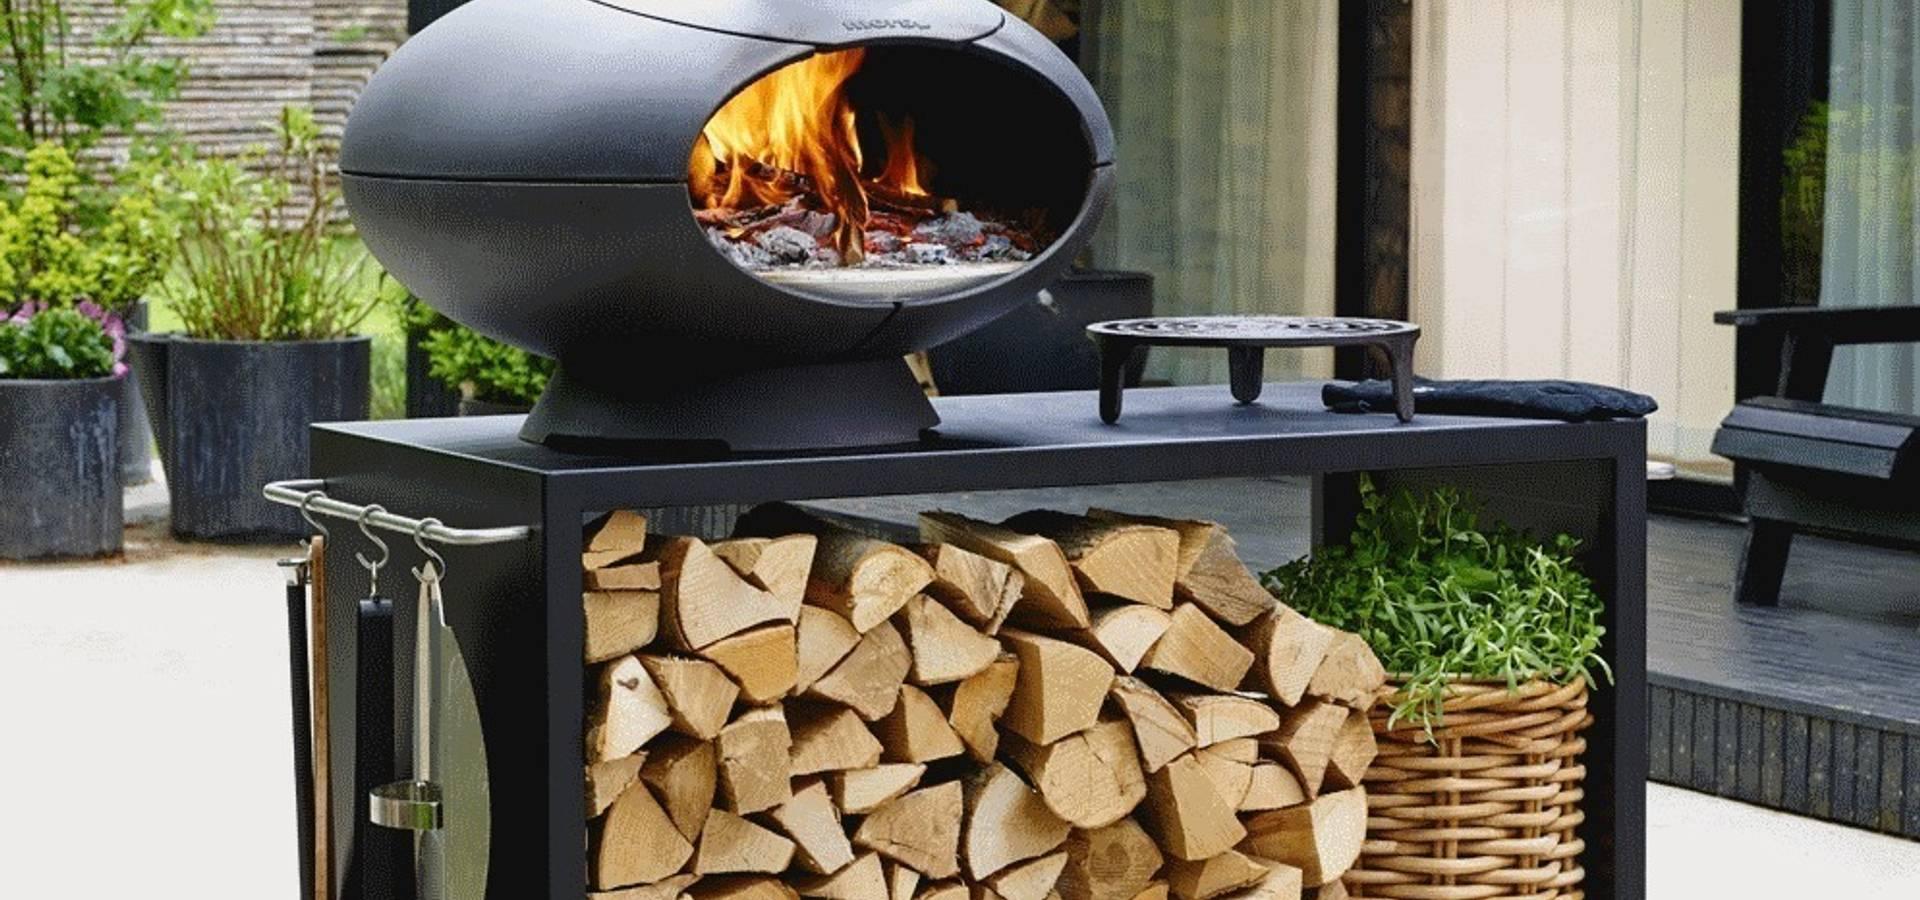 morso four pizza et barbecue de tenue d 39 jardin homify. Black Bedroom Furniture Sets. Home Design Ideas